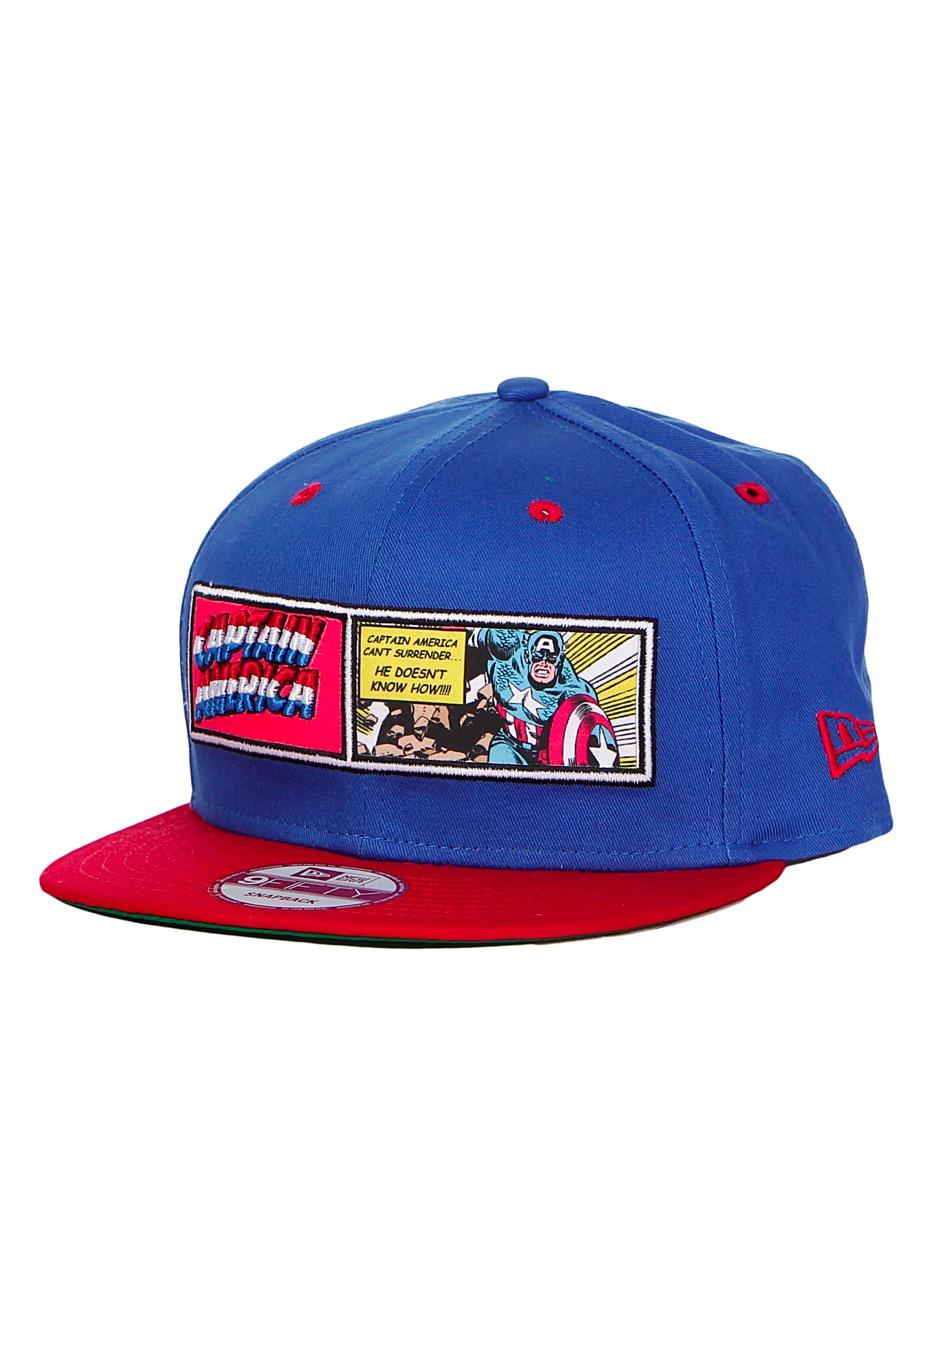 New Era - Comic Panel Captain America Blue/Red Snapback - Cap